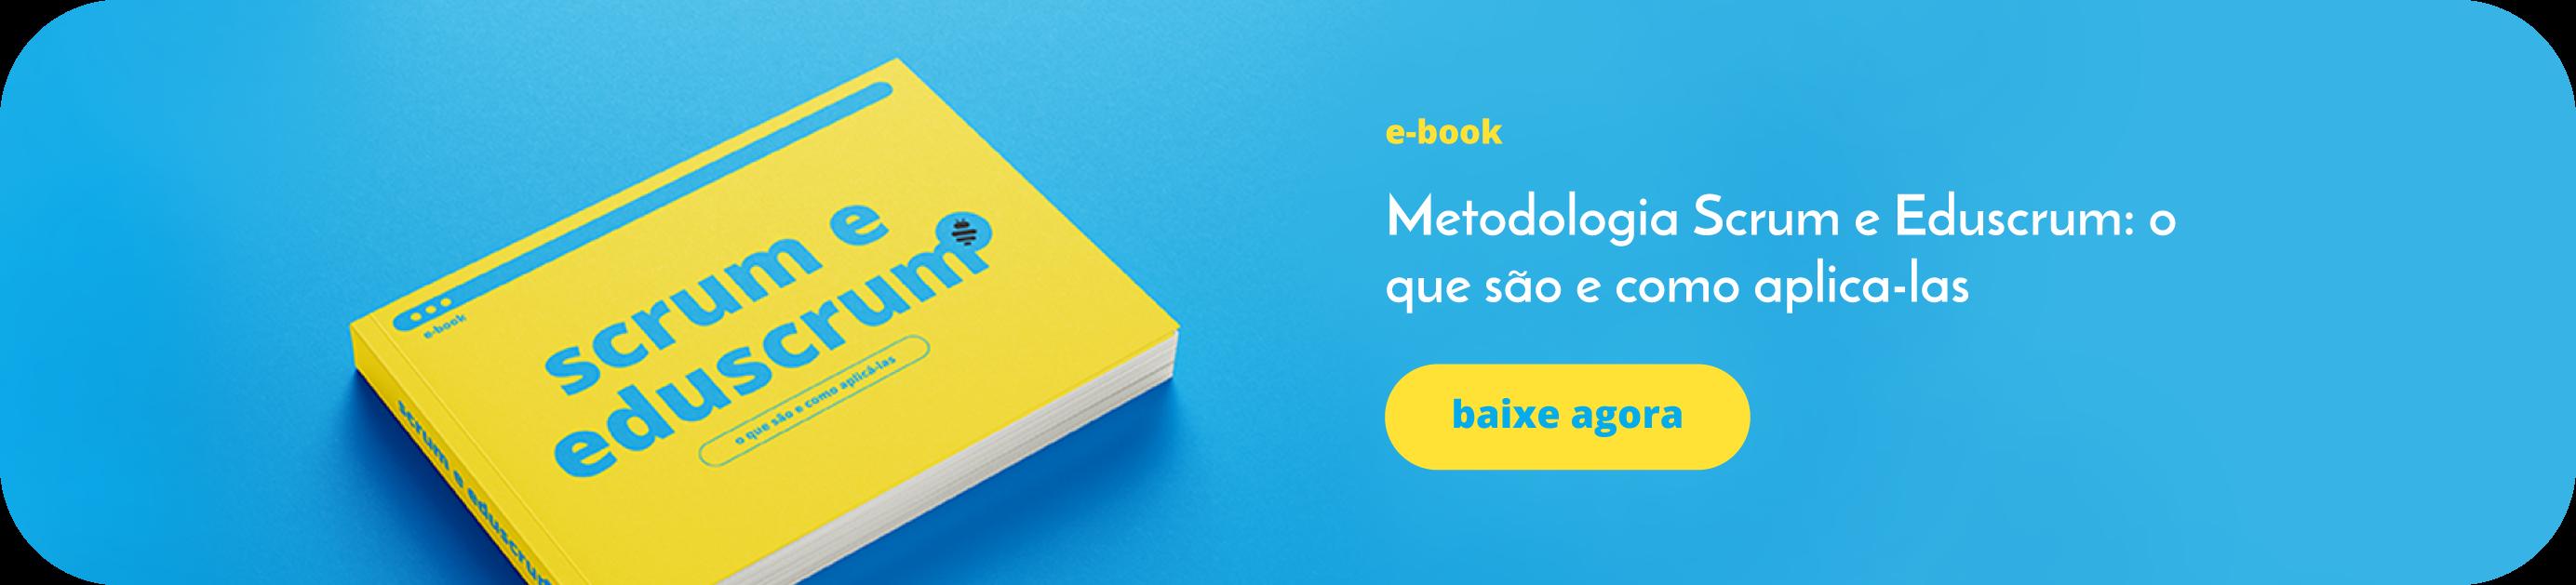 Baixe o Ebook Sobre metodologia Scrum e Eduscrum | Sambatech